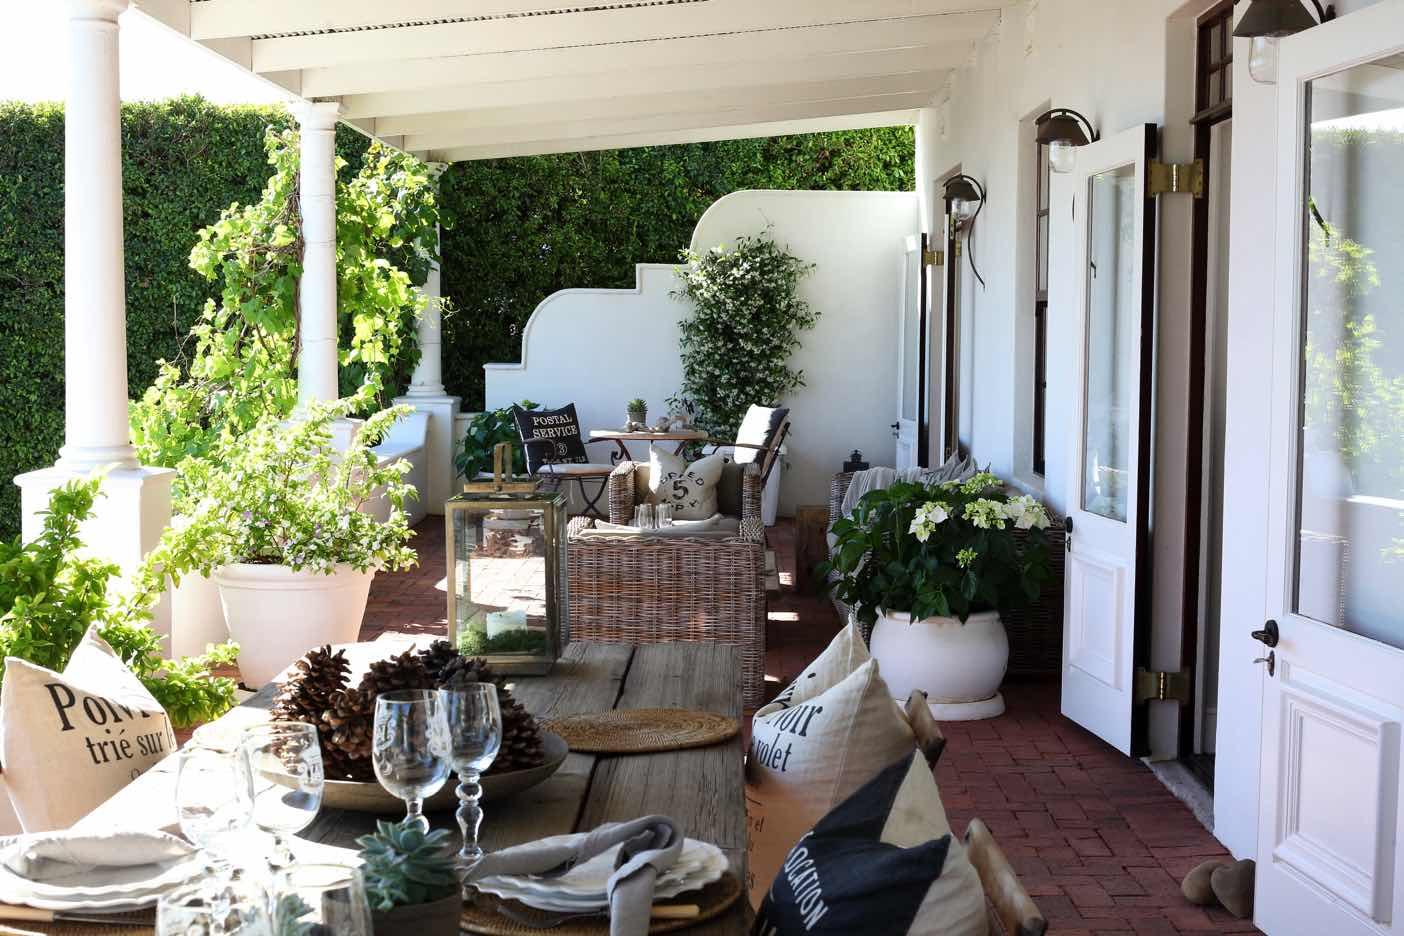 Juwel im Cape Dutch Stil